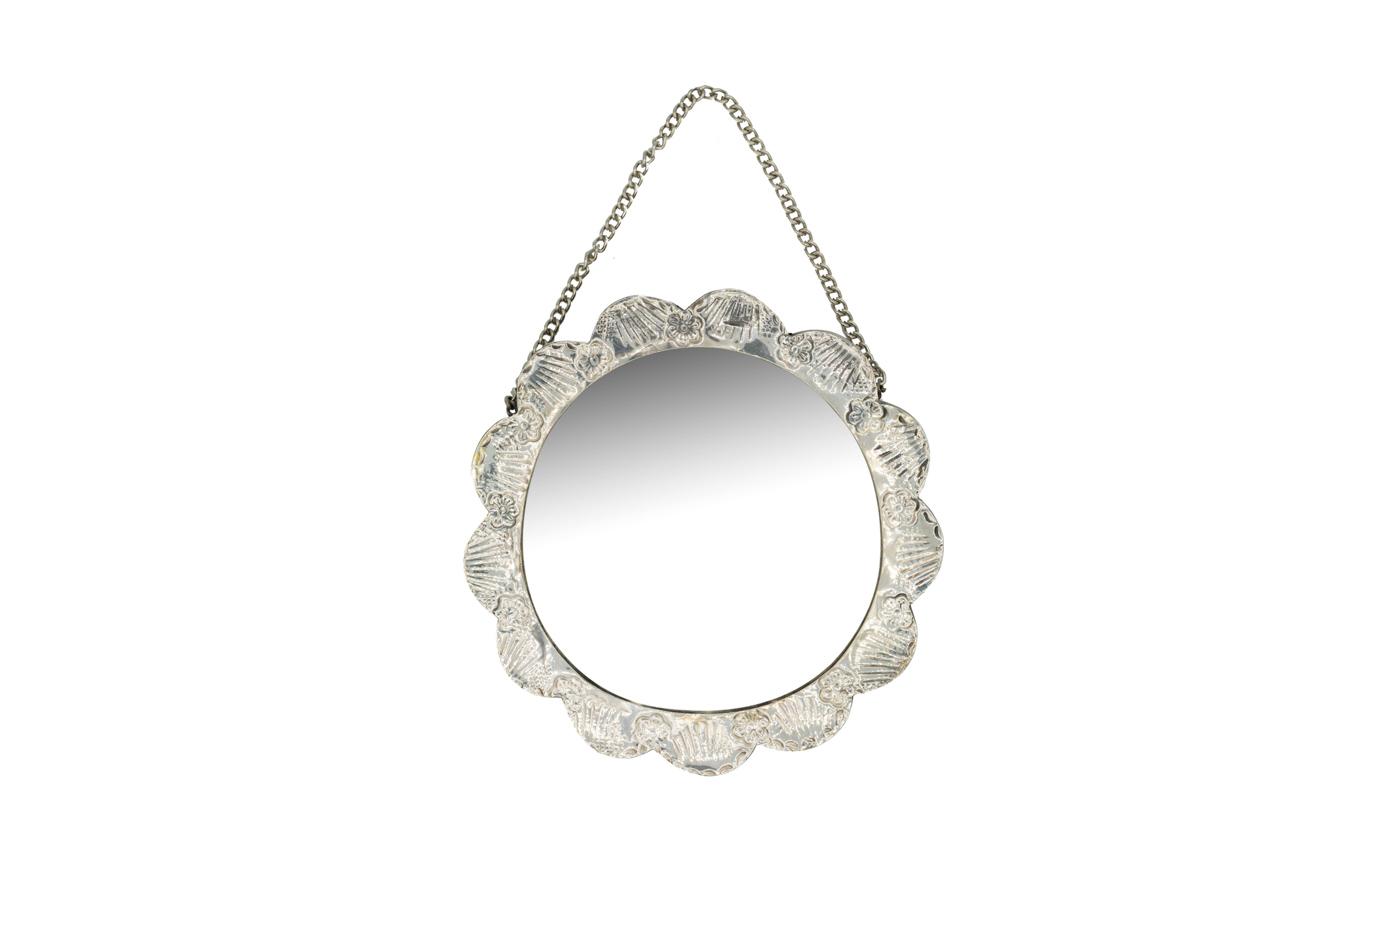 Turkish silver wall-hanging mirror-round